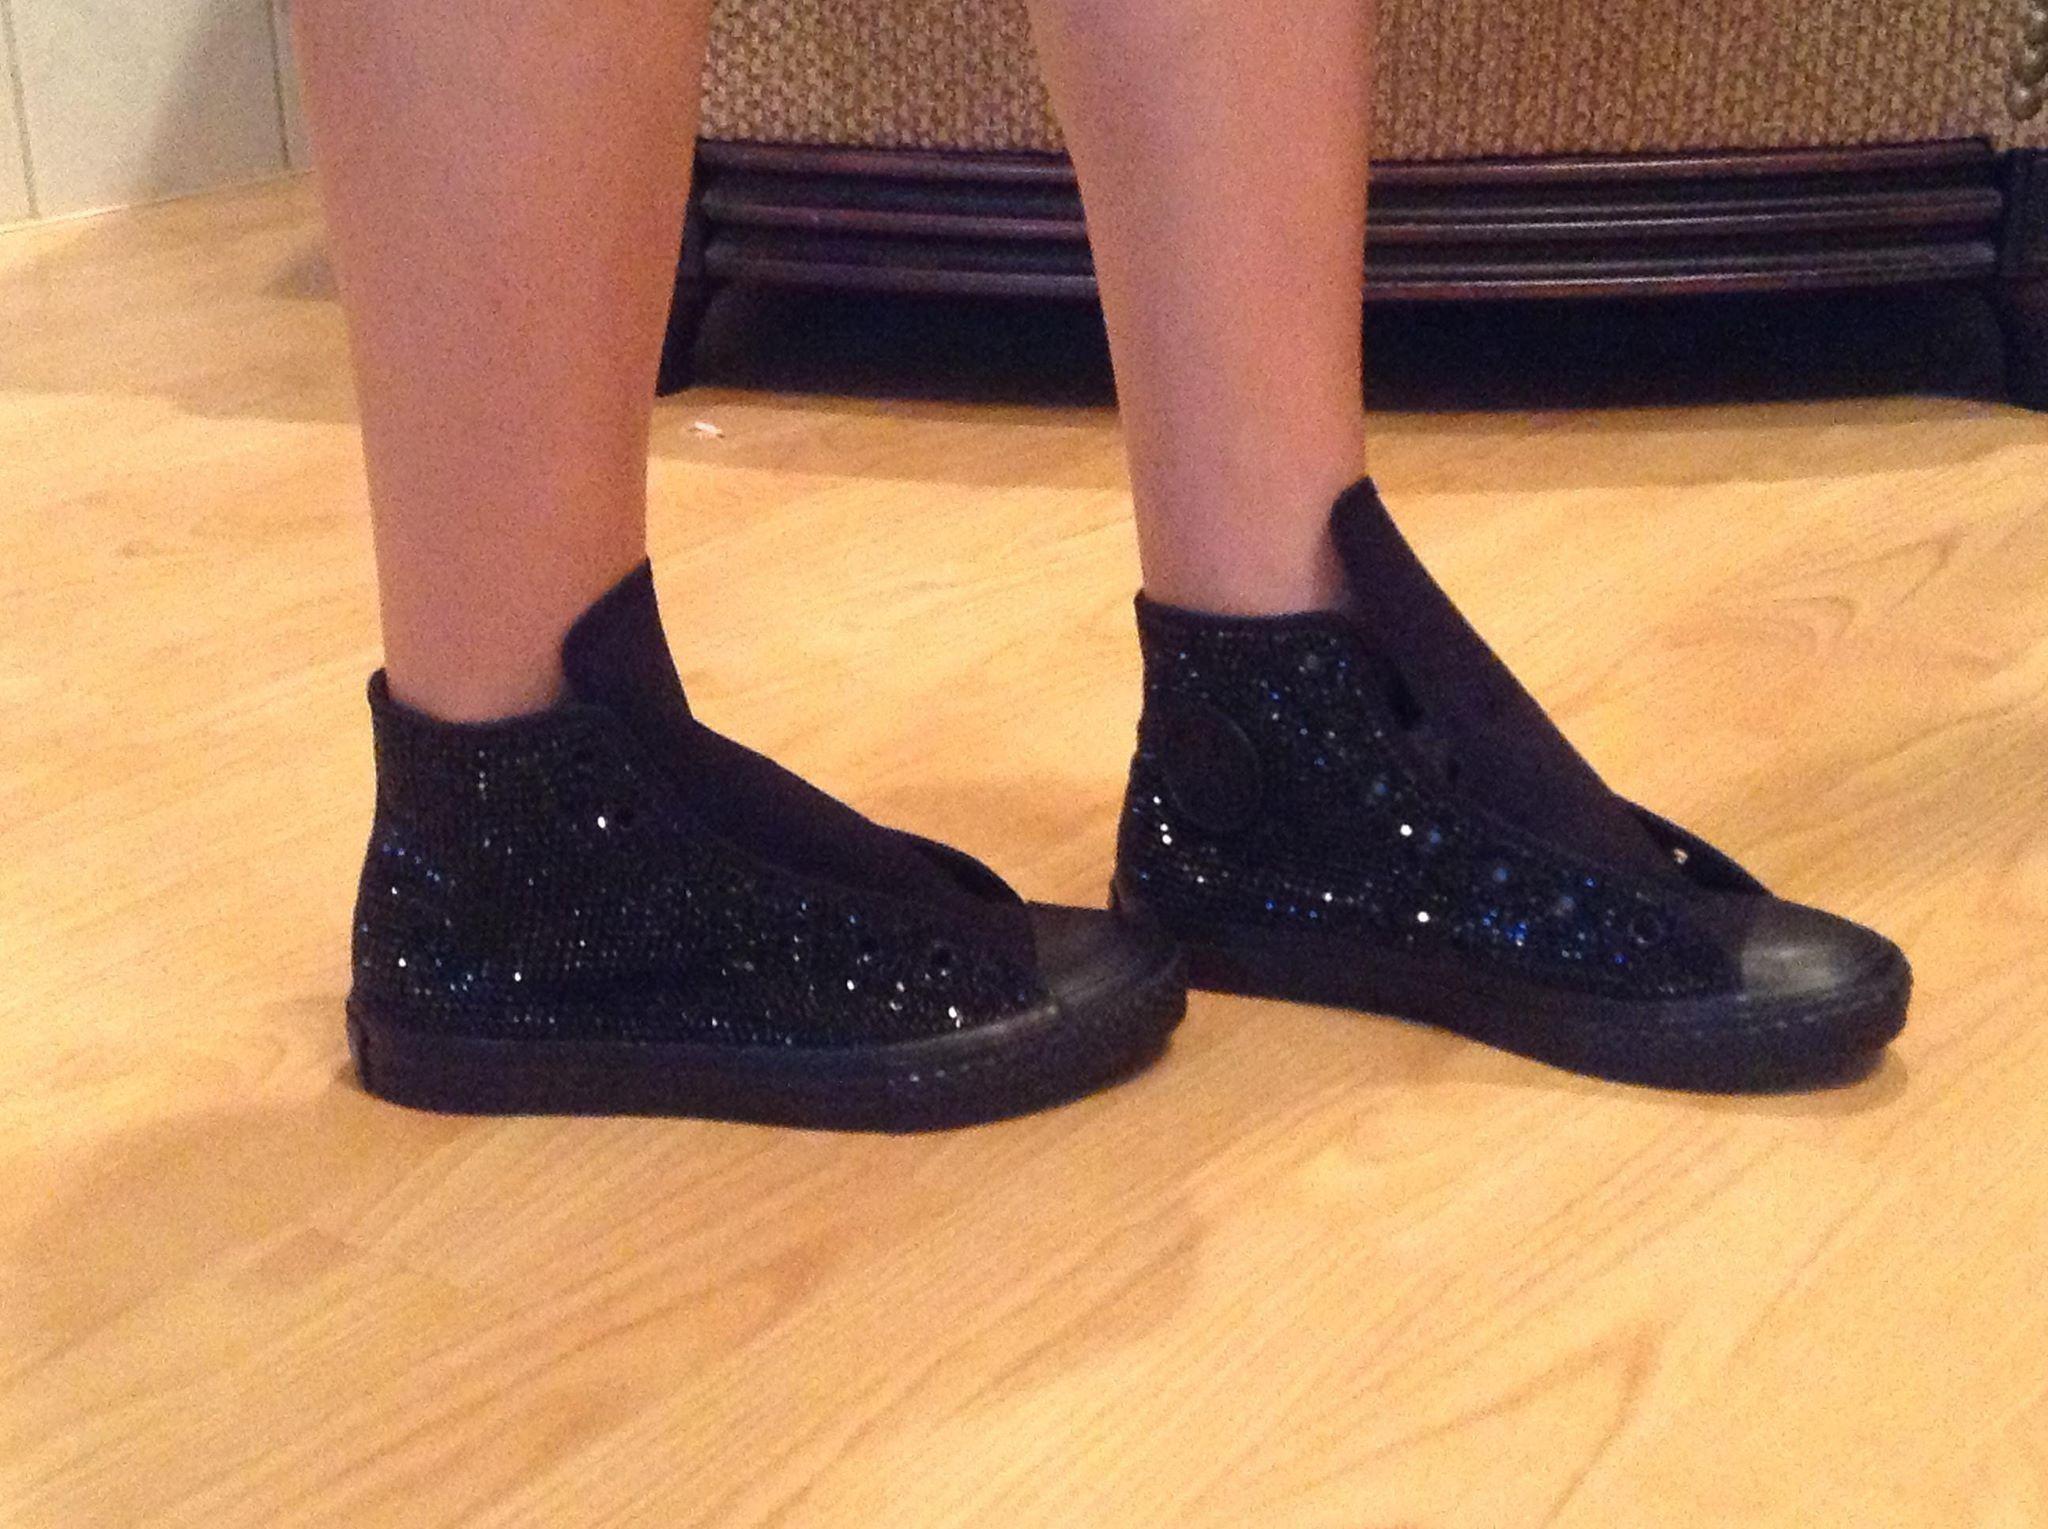 black converse with black laces